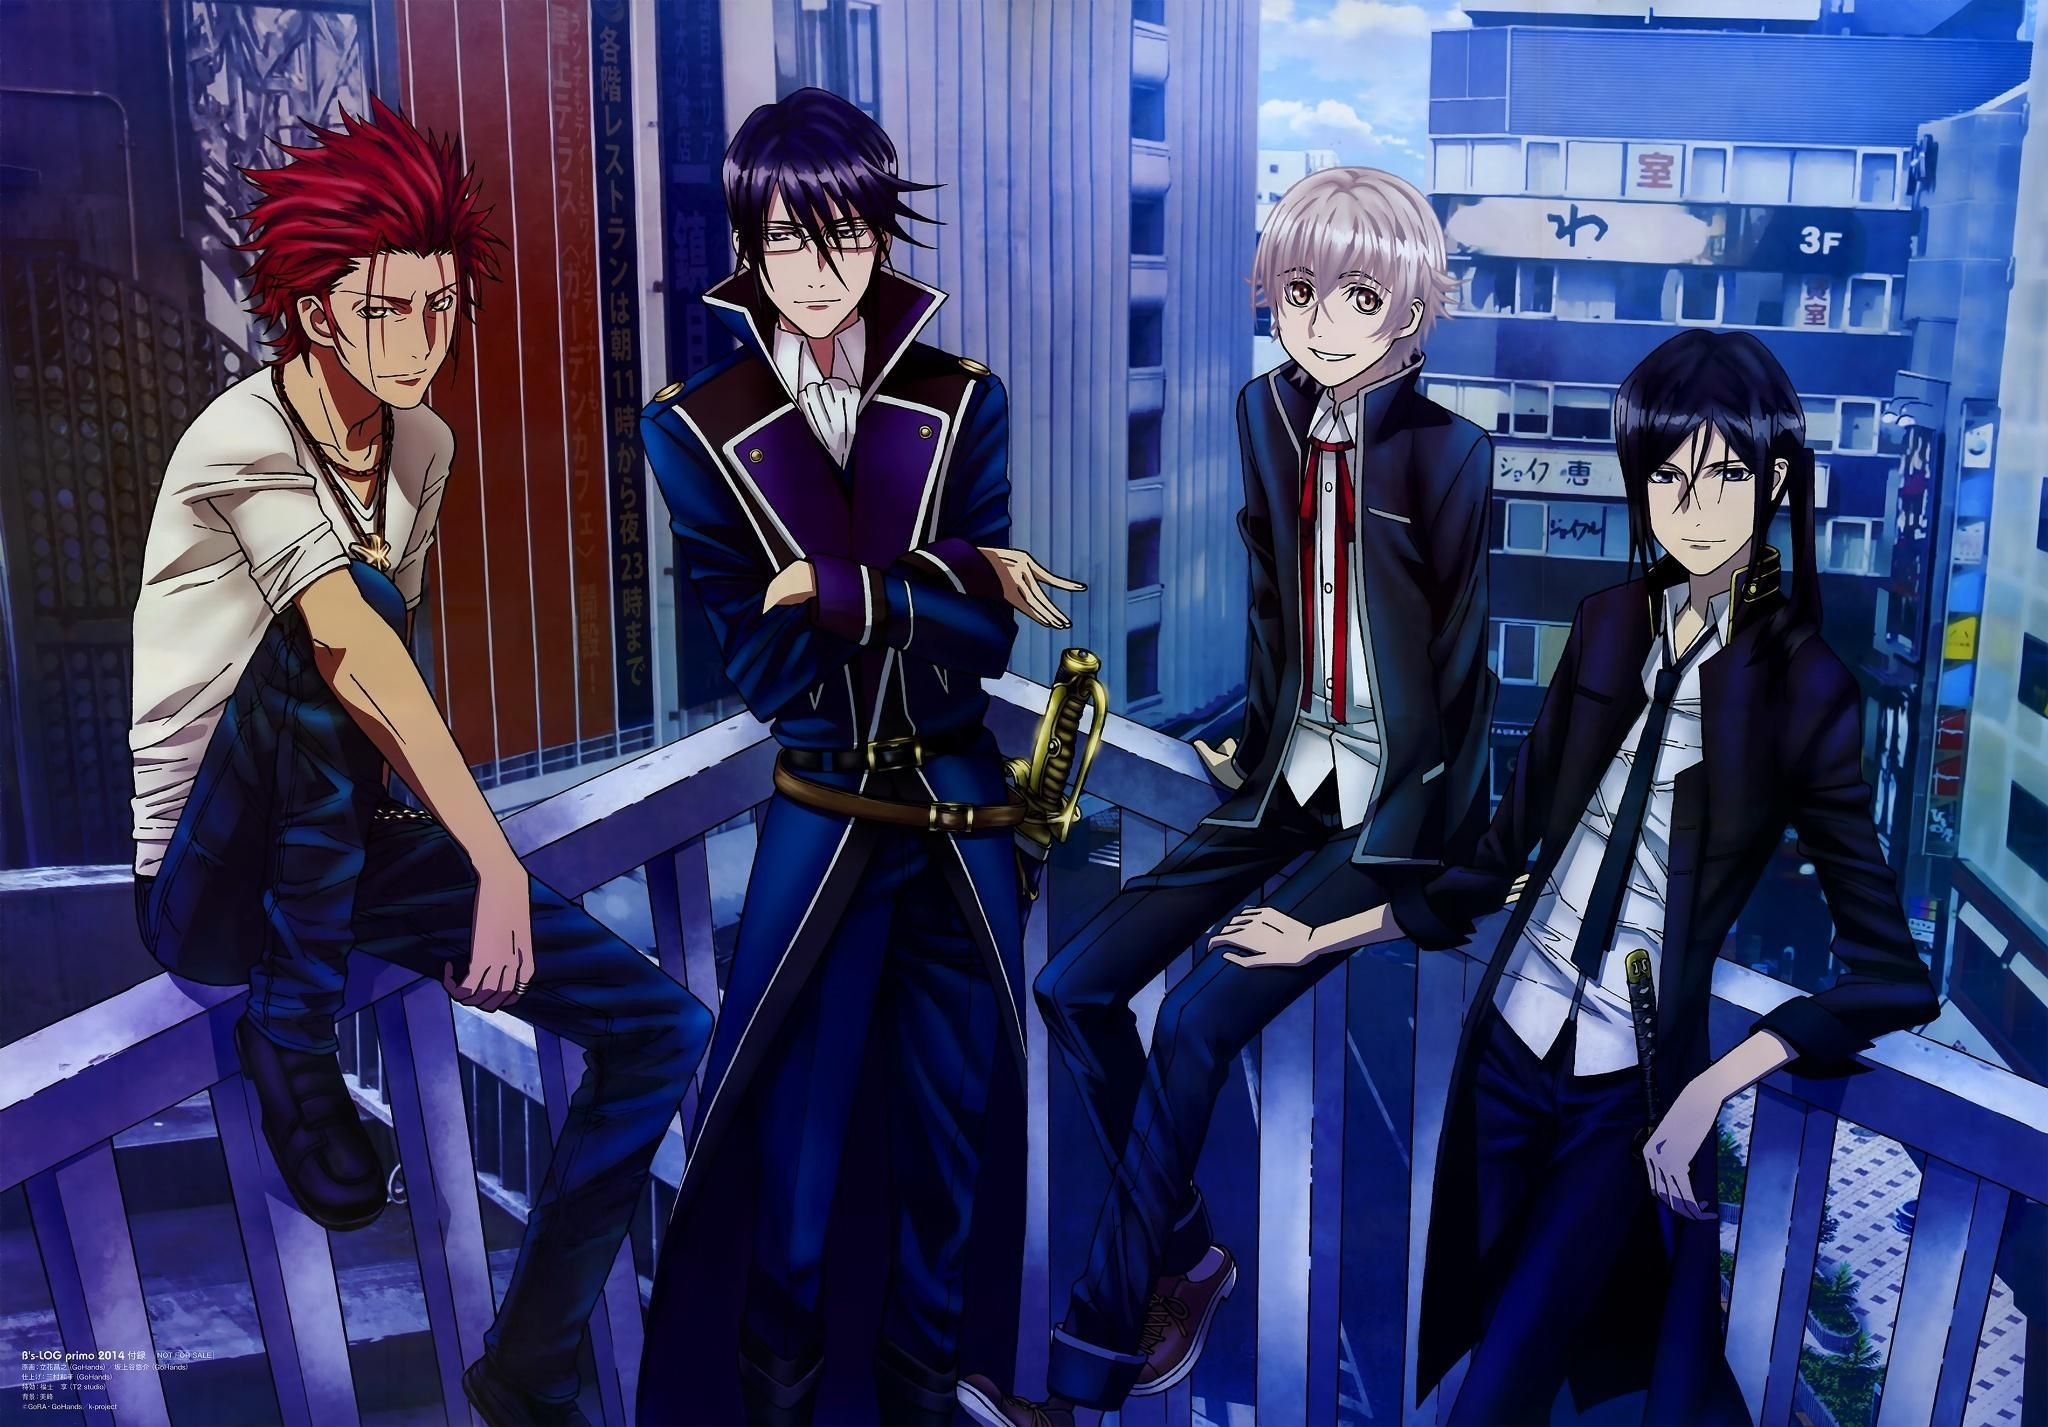 2048x1427 Anime K Project Mikoto Suoh Reisi Munakata